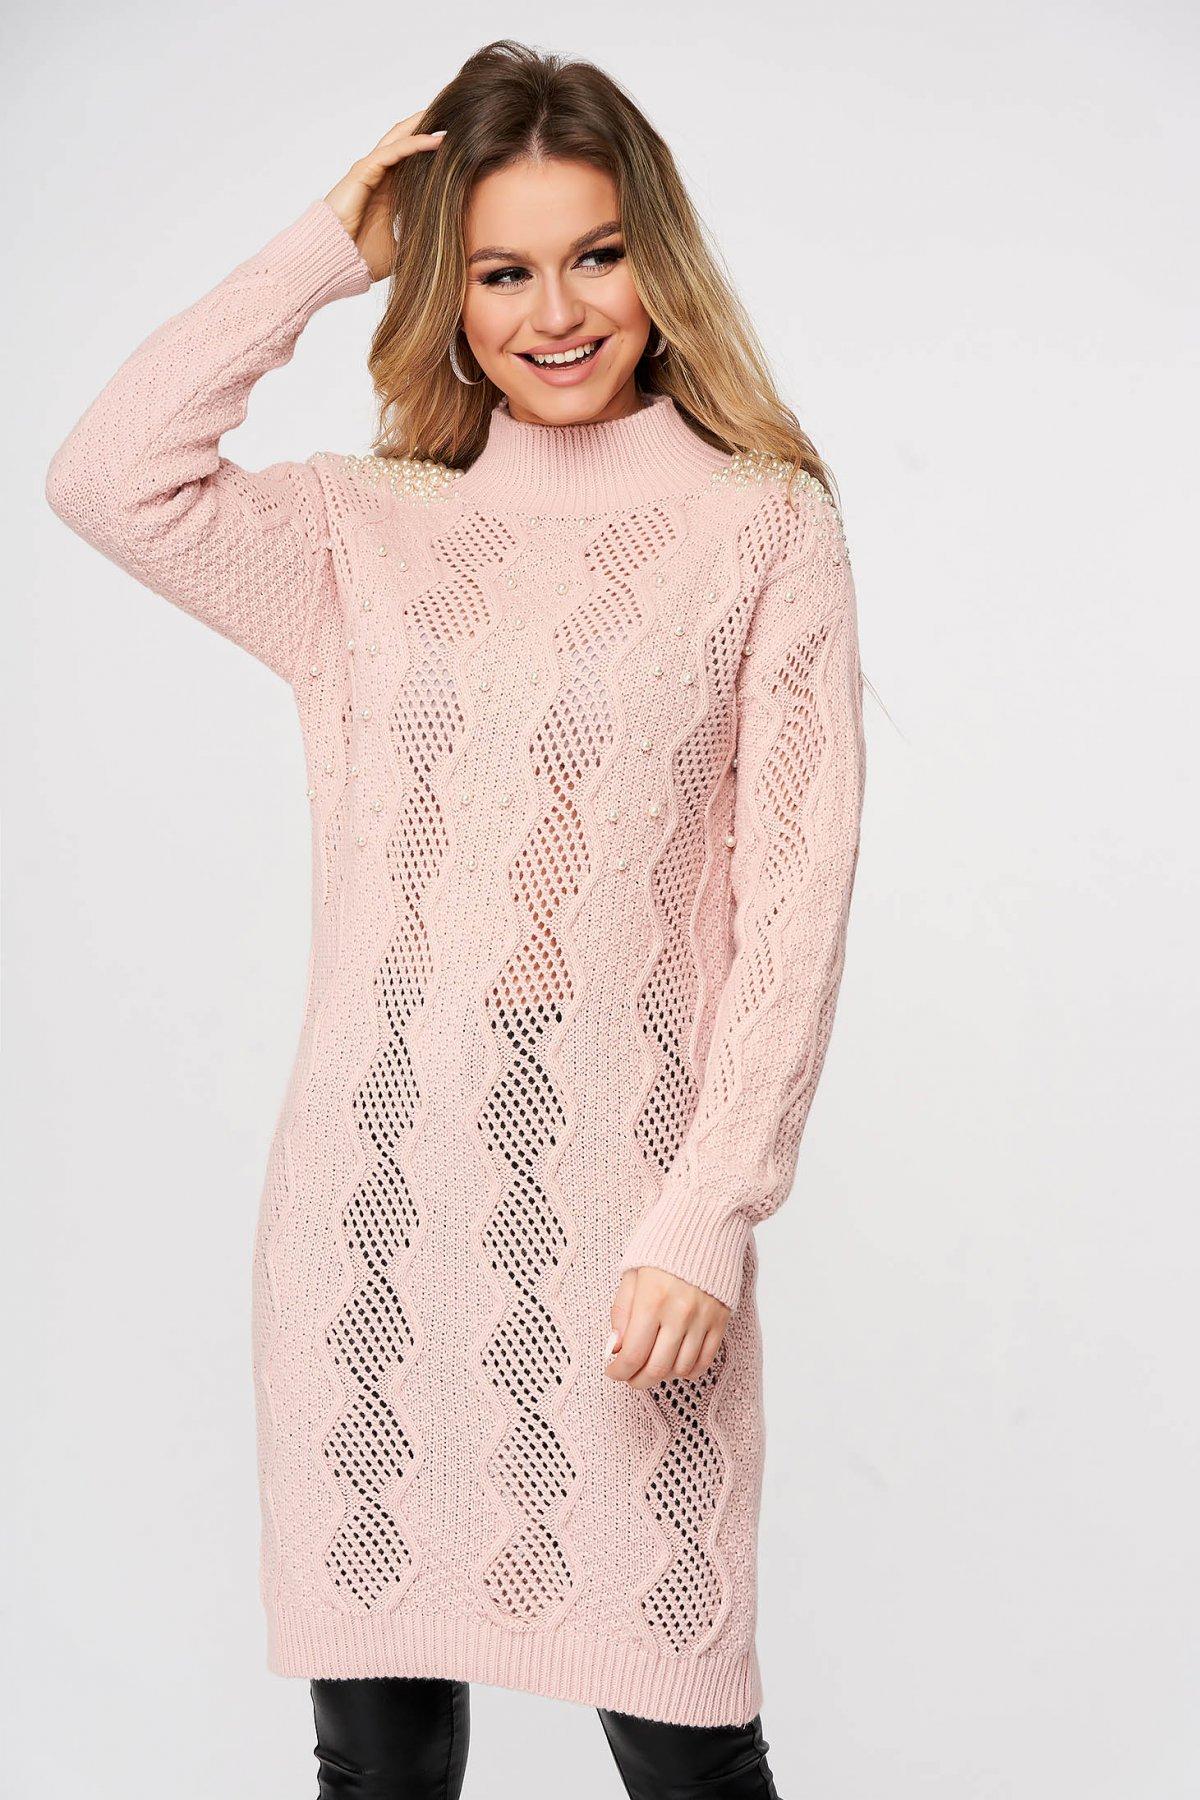 Pulover SunShine roz deschis lunga tricotat cu croi larg cu aplicatii cu perle